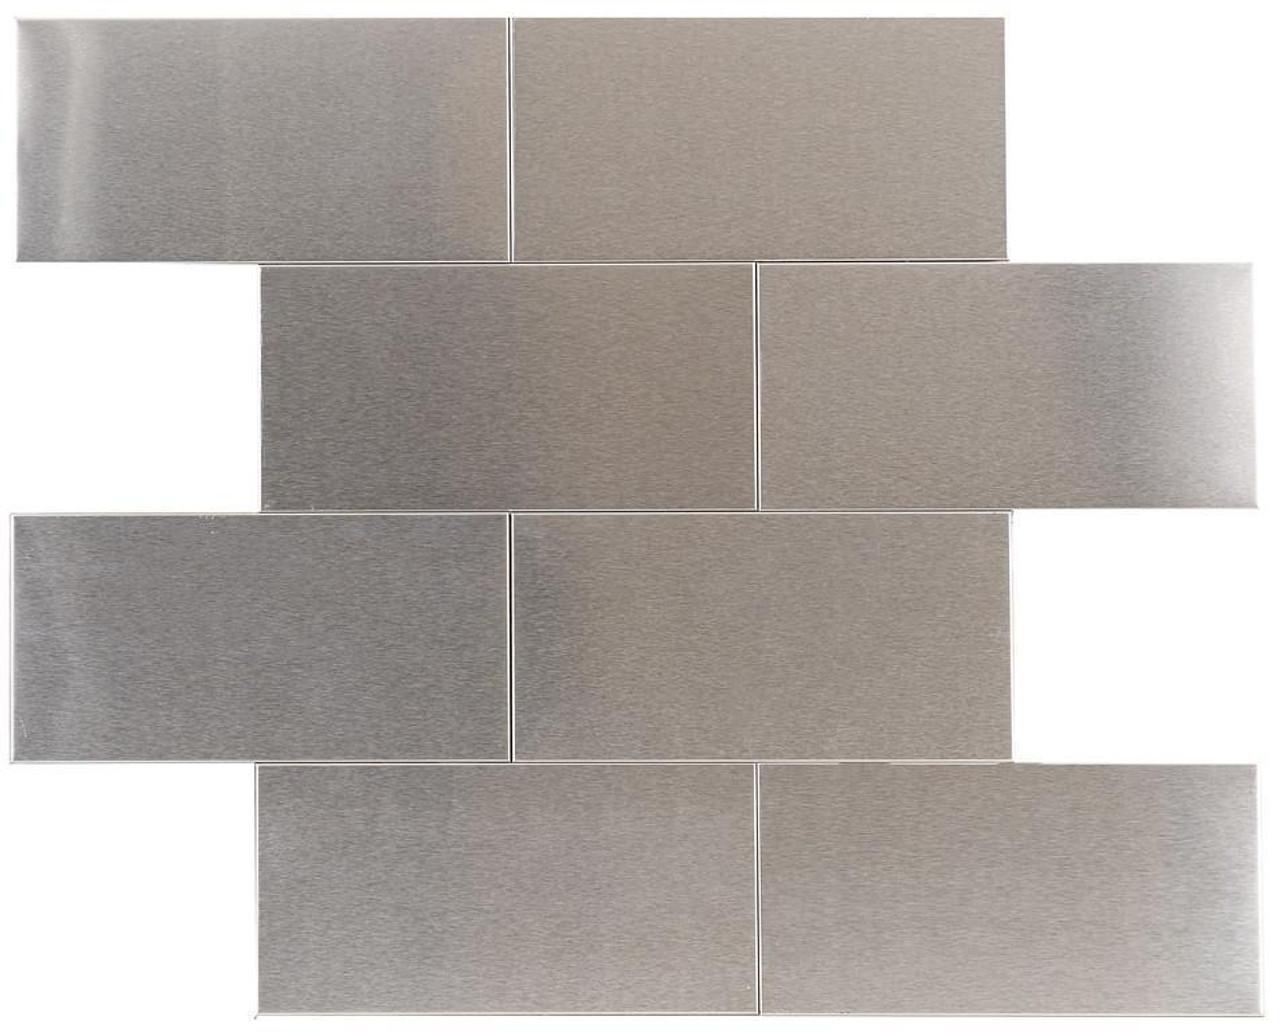 UBC Stainless Steel Tile Backsplash 3 x 6 Mosaic 411-007